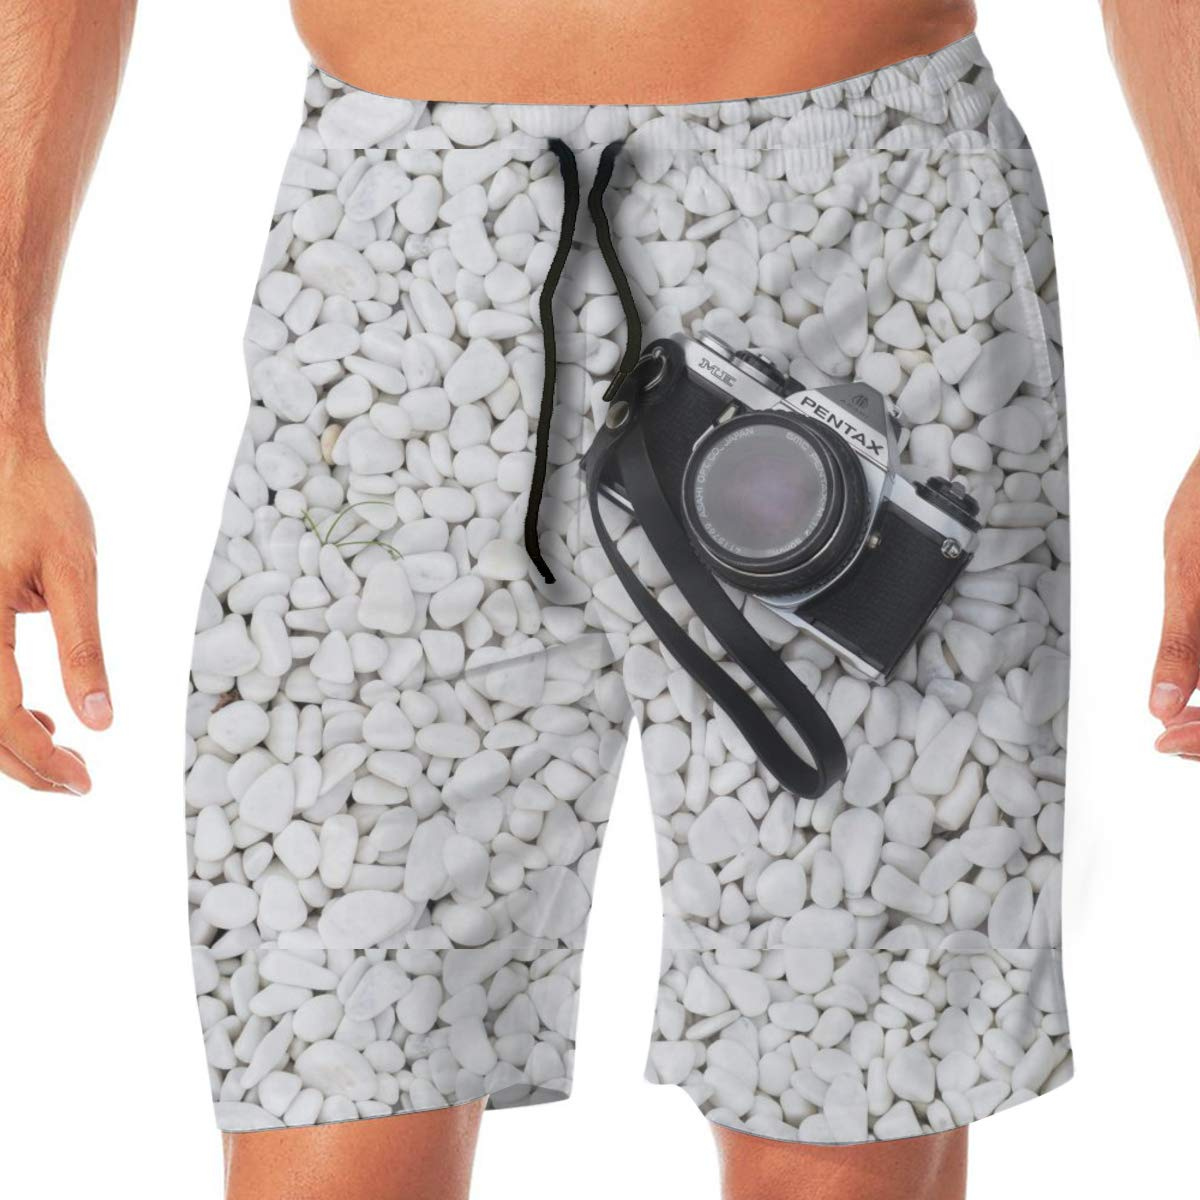 XL L Camera Beach Trunks Mens 3D Printed Beach Board Shorts with Pockets M XXL